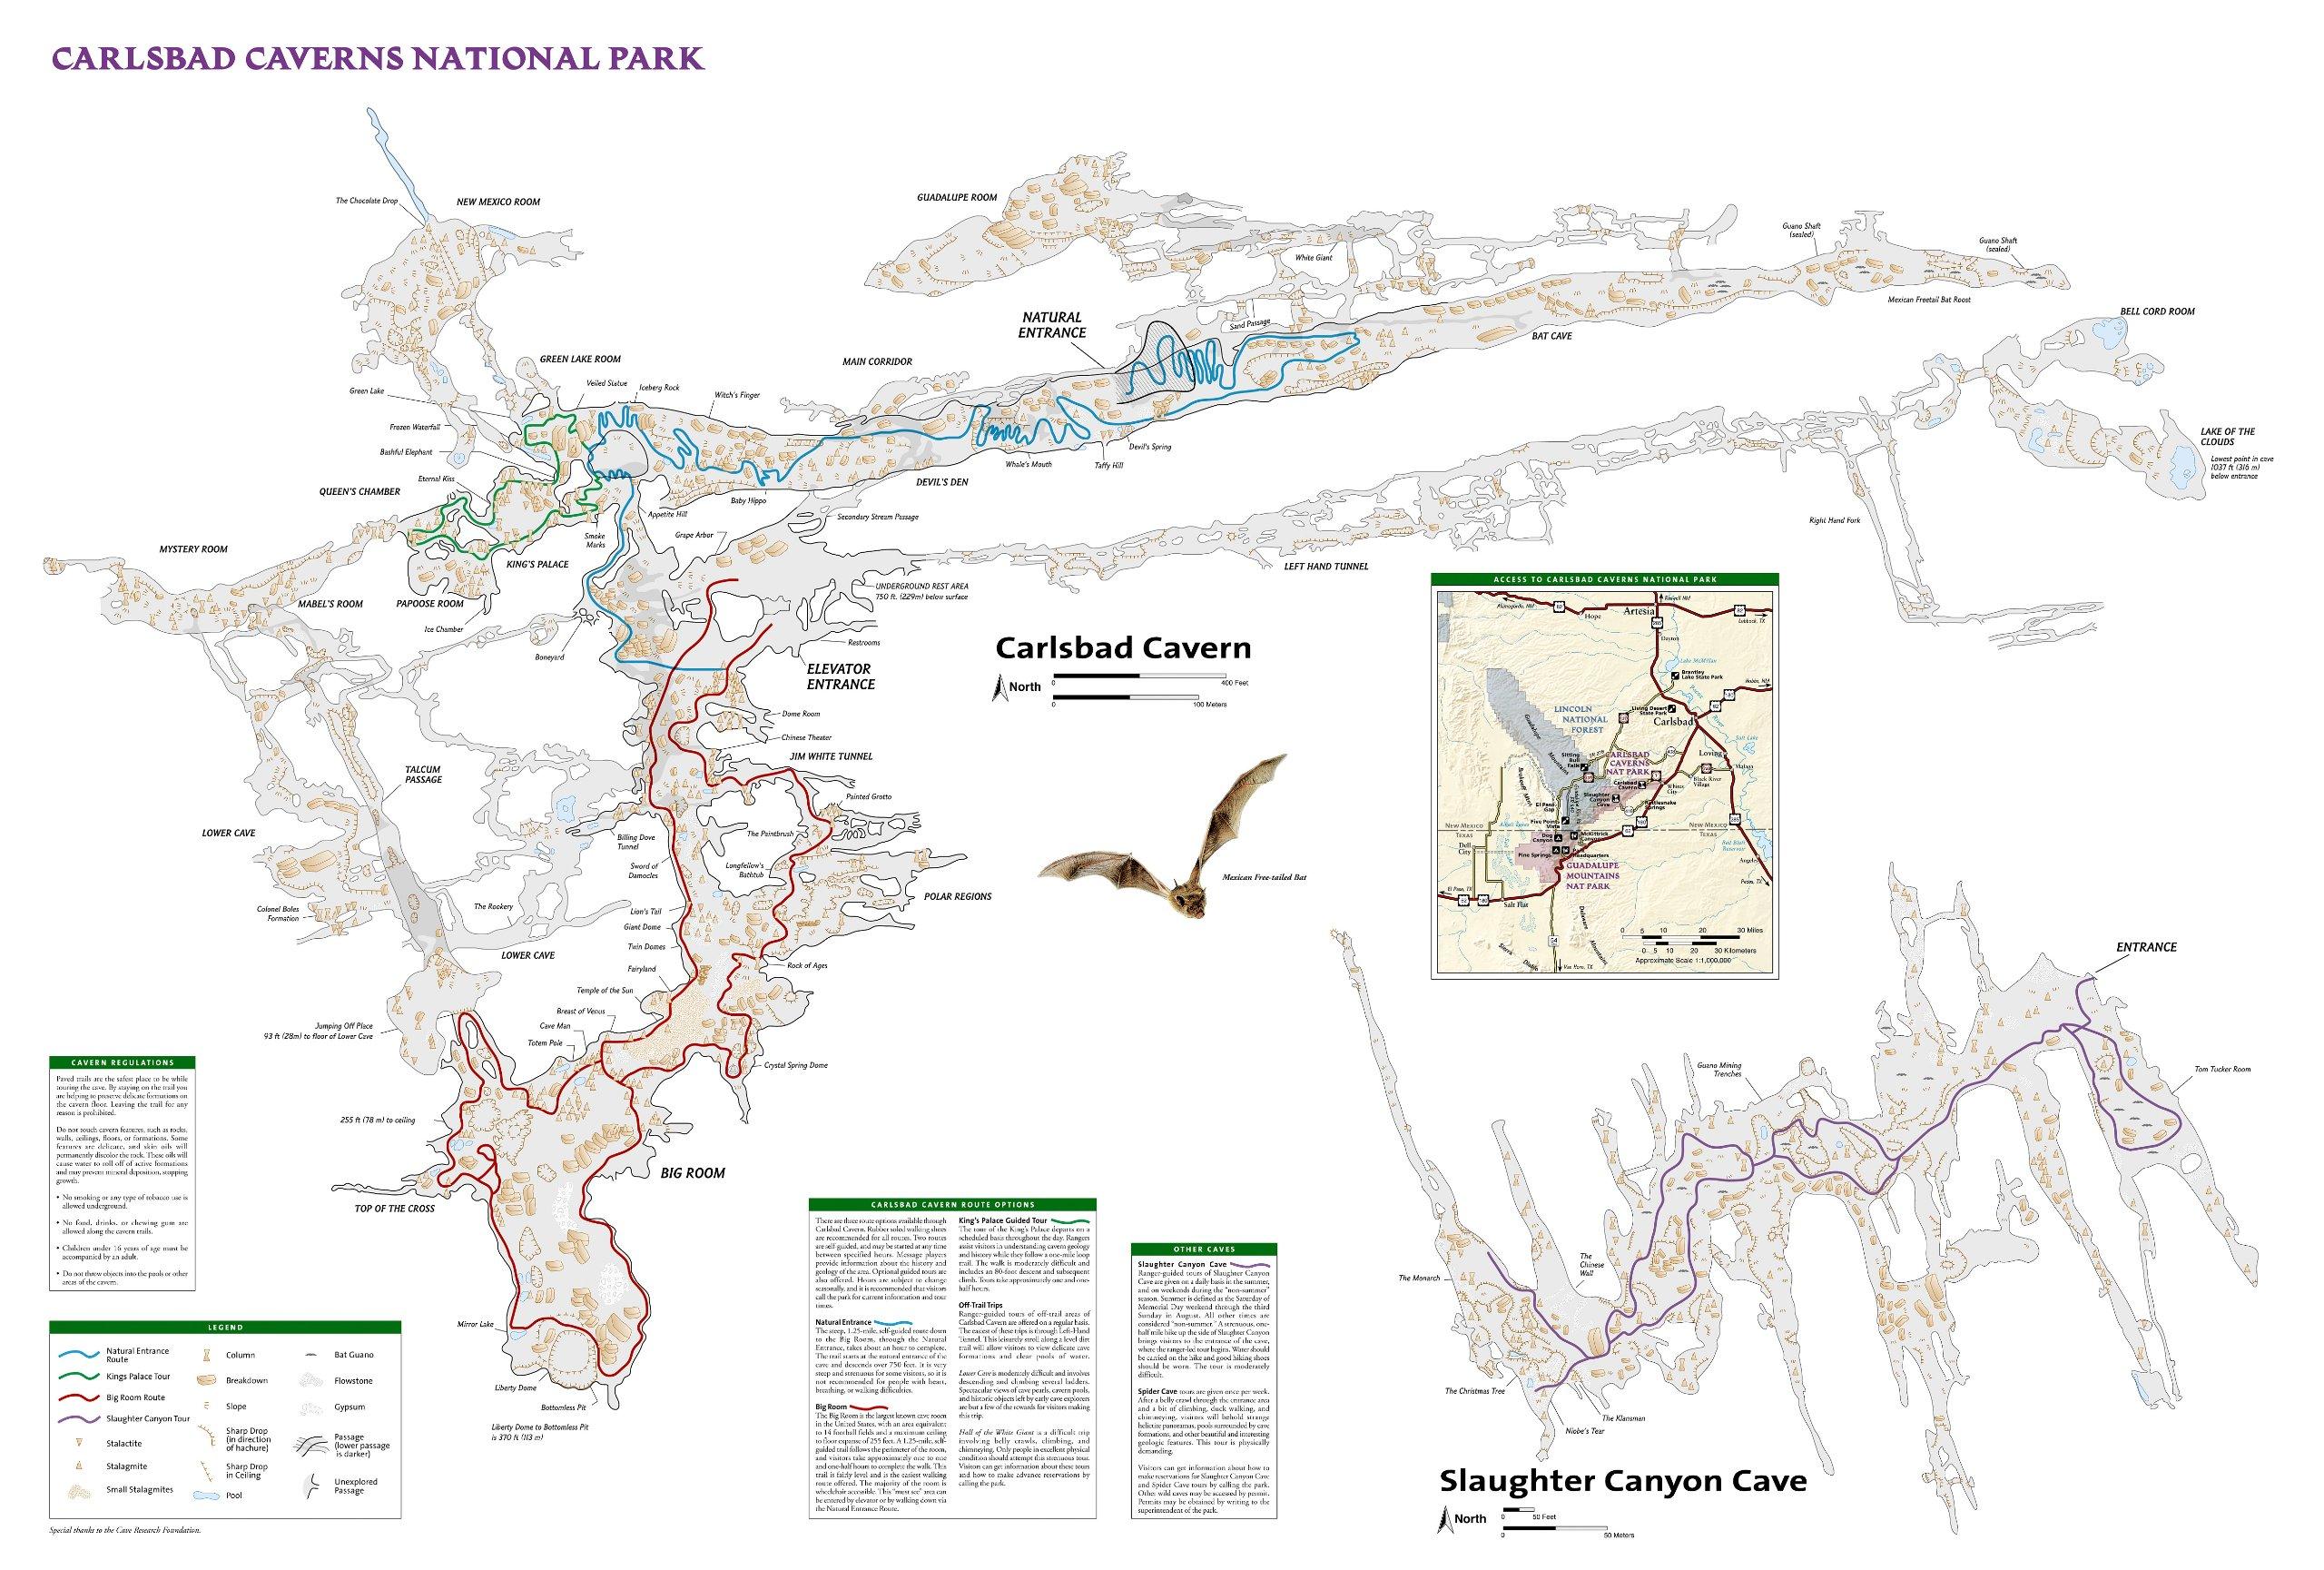 Carlsbad Caverns Maps on